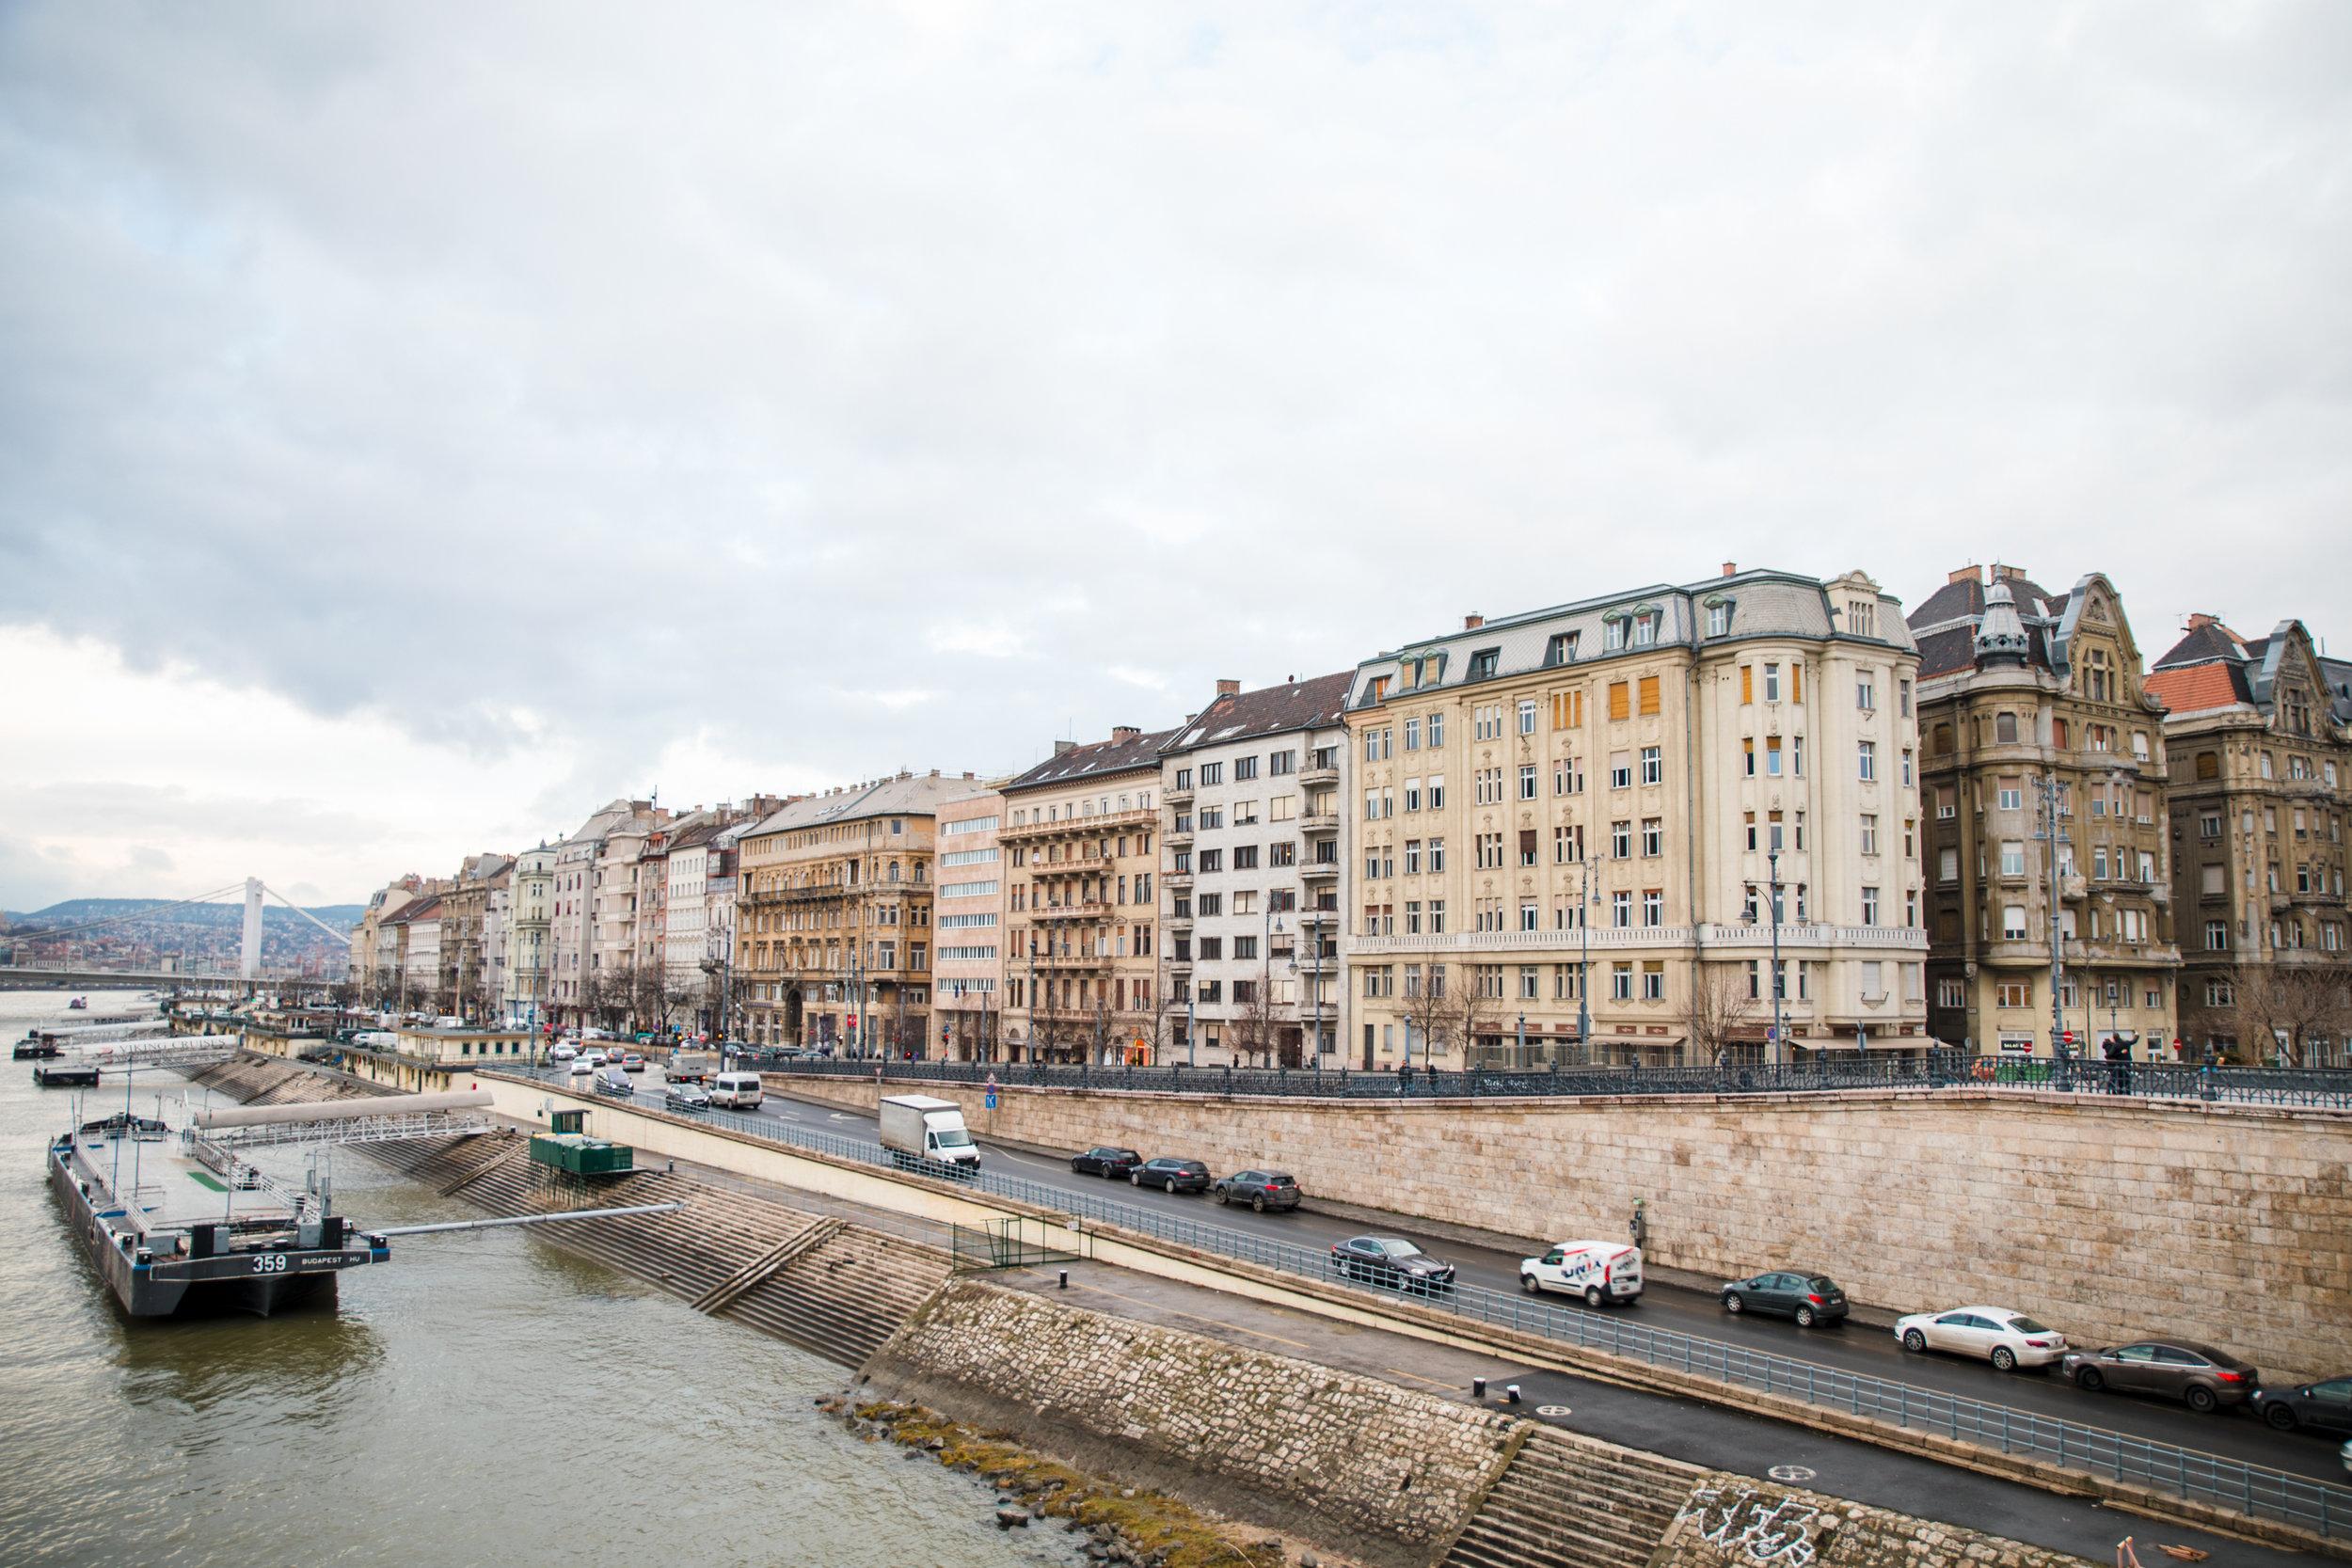 budapest architecture tour